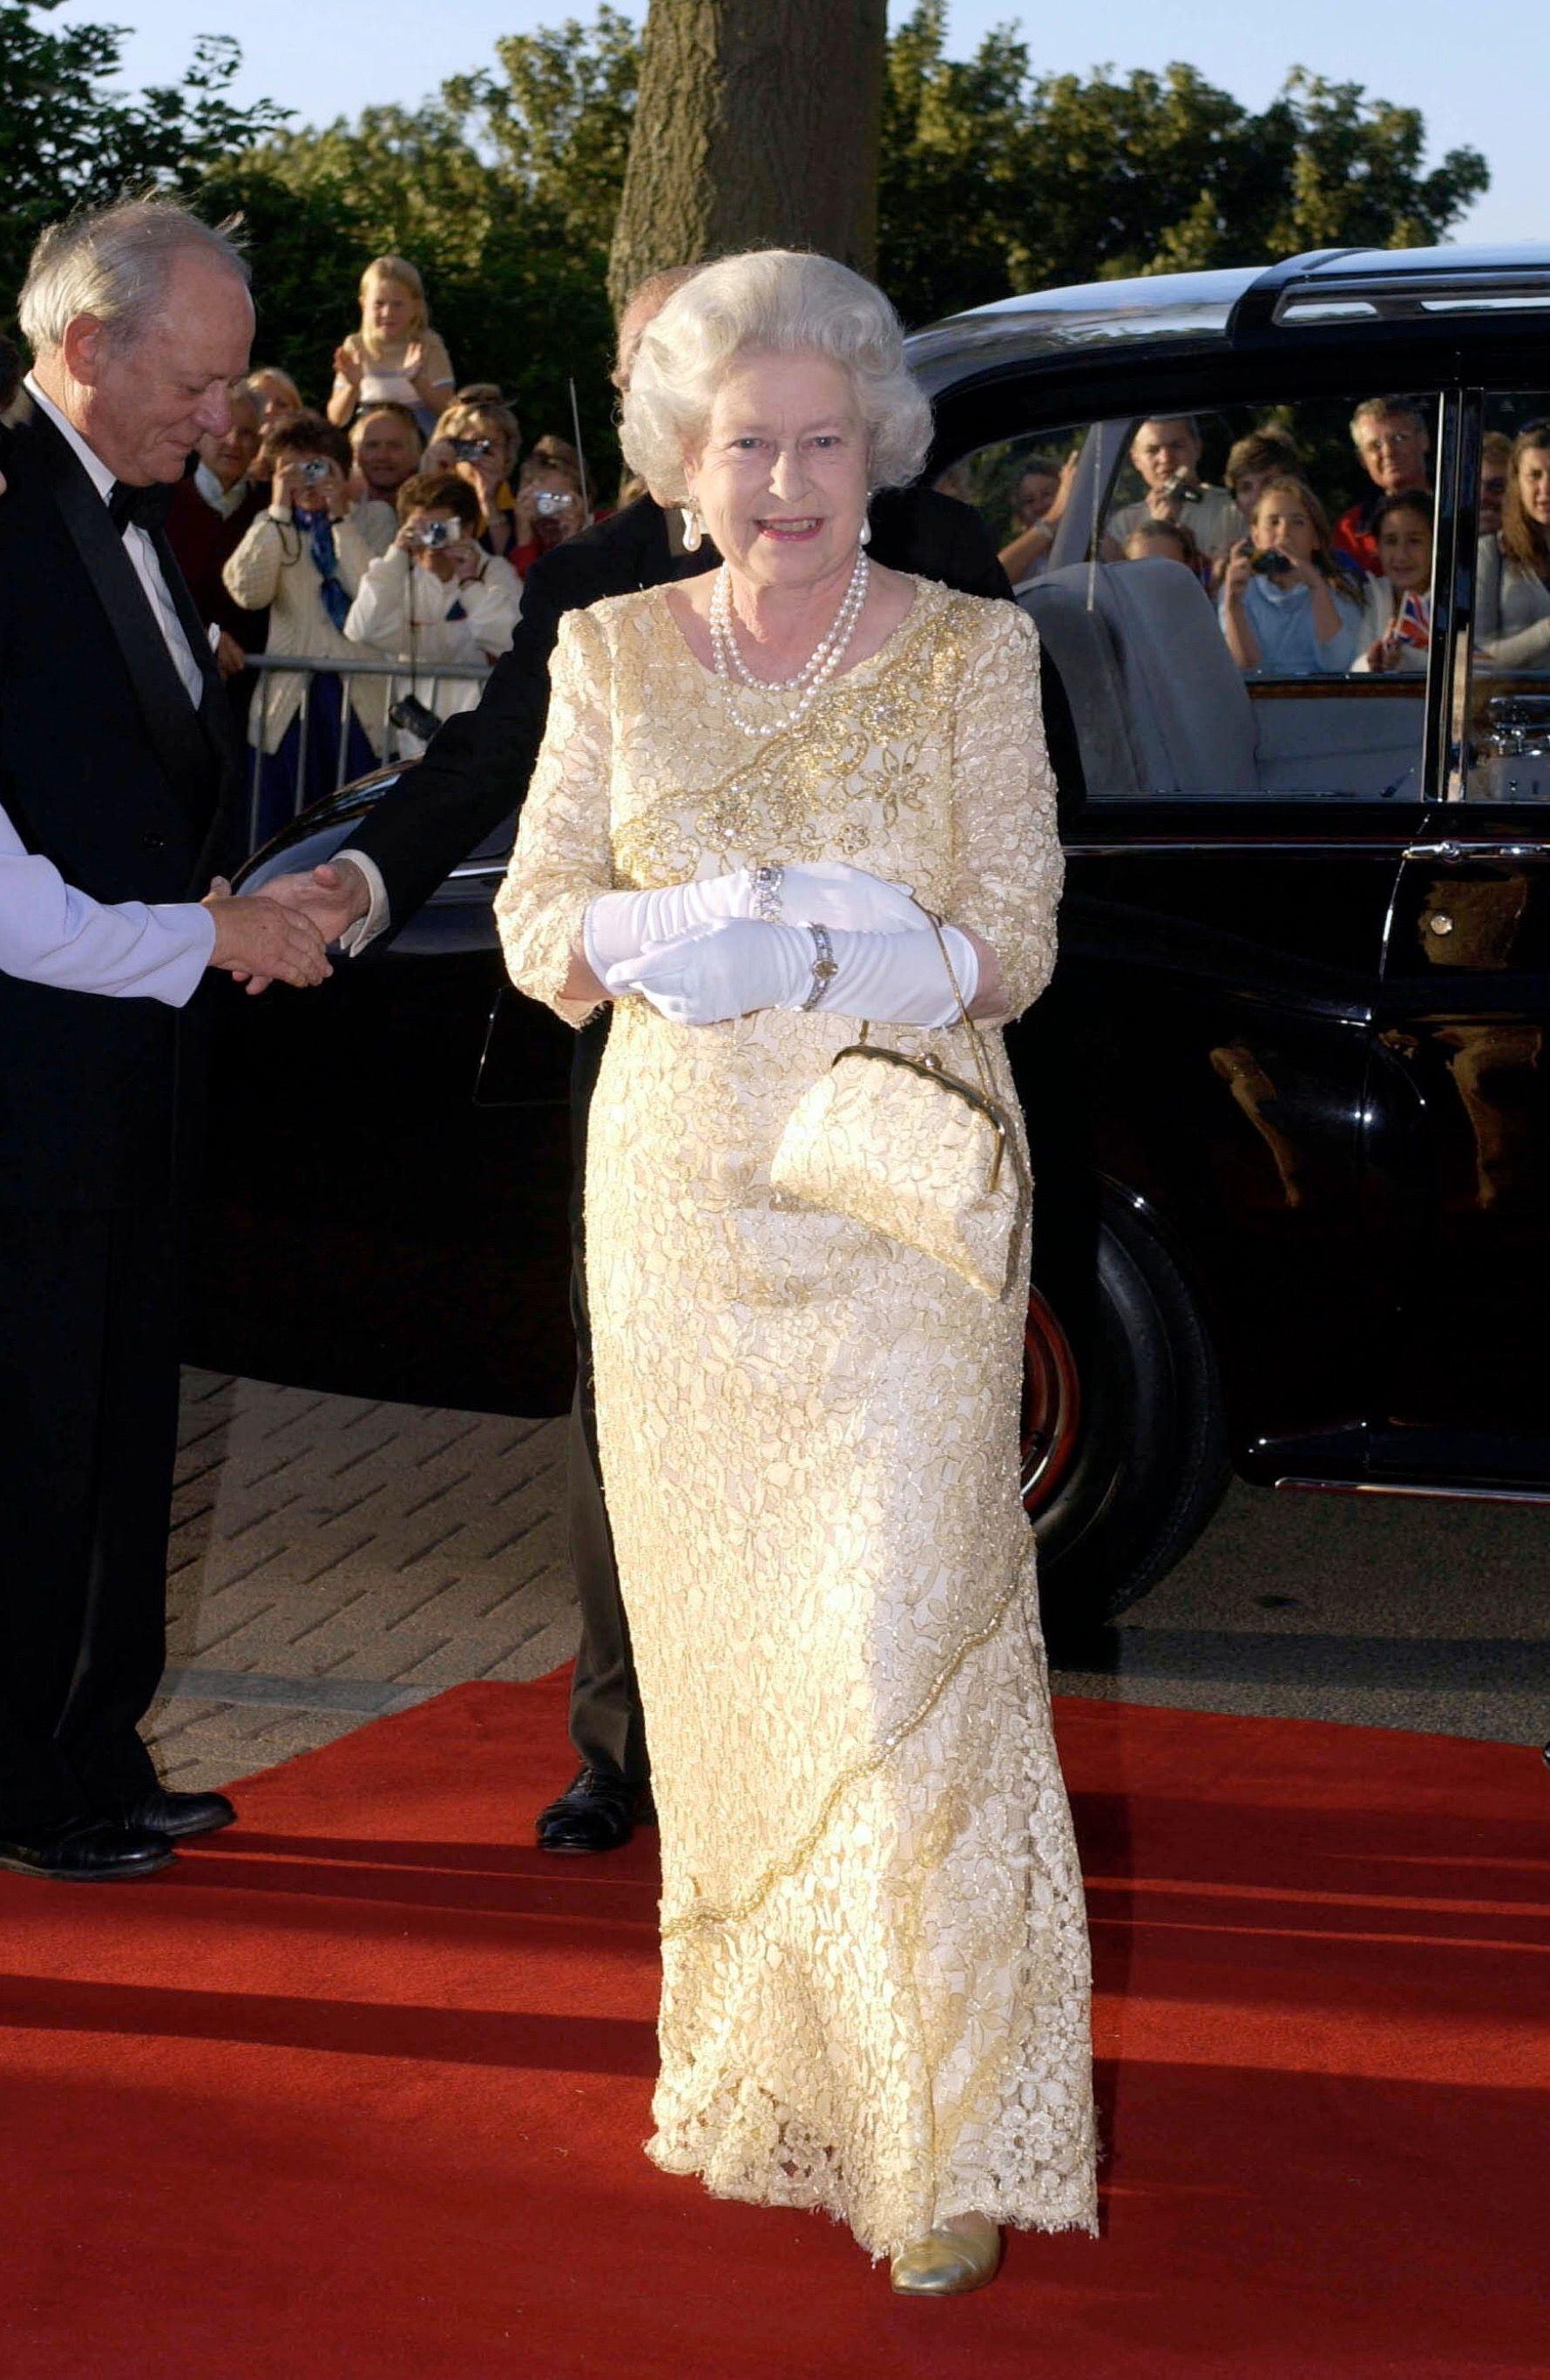 One of my favourite Queen Elizabeth II gowns........MY GOODNESS...... ELIZABETH LOOKS SO BEAUTIFUL...............ccp